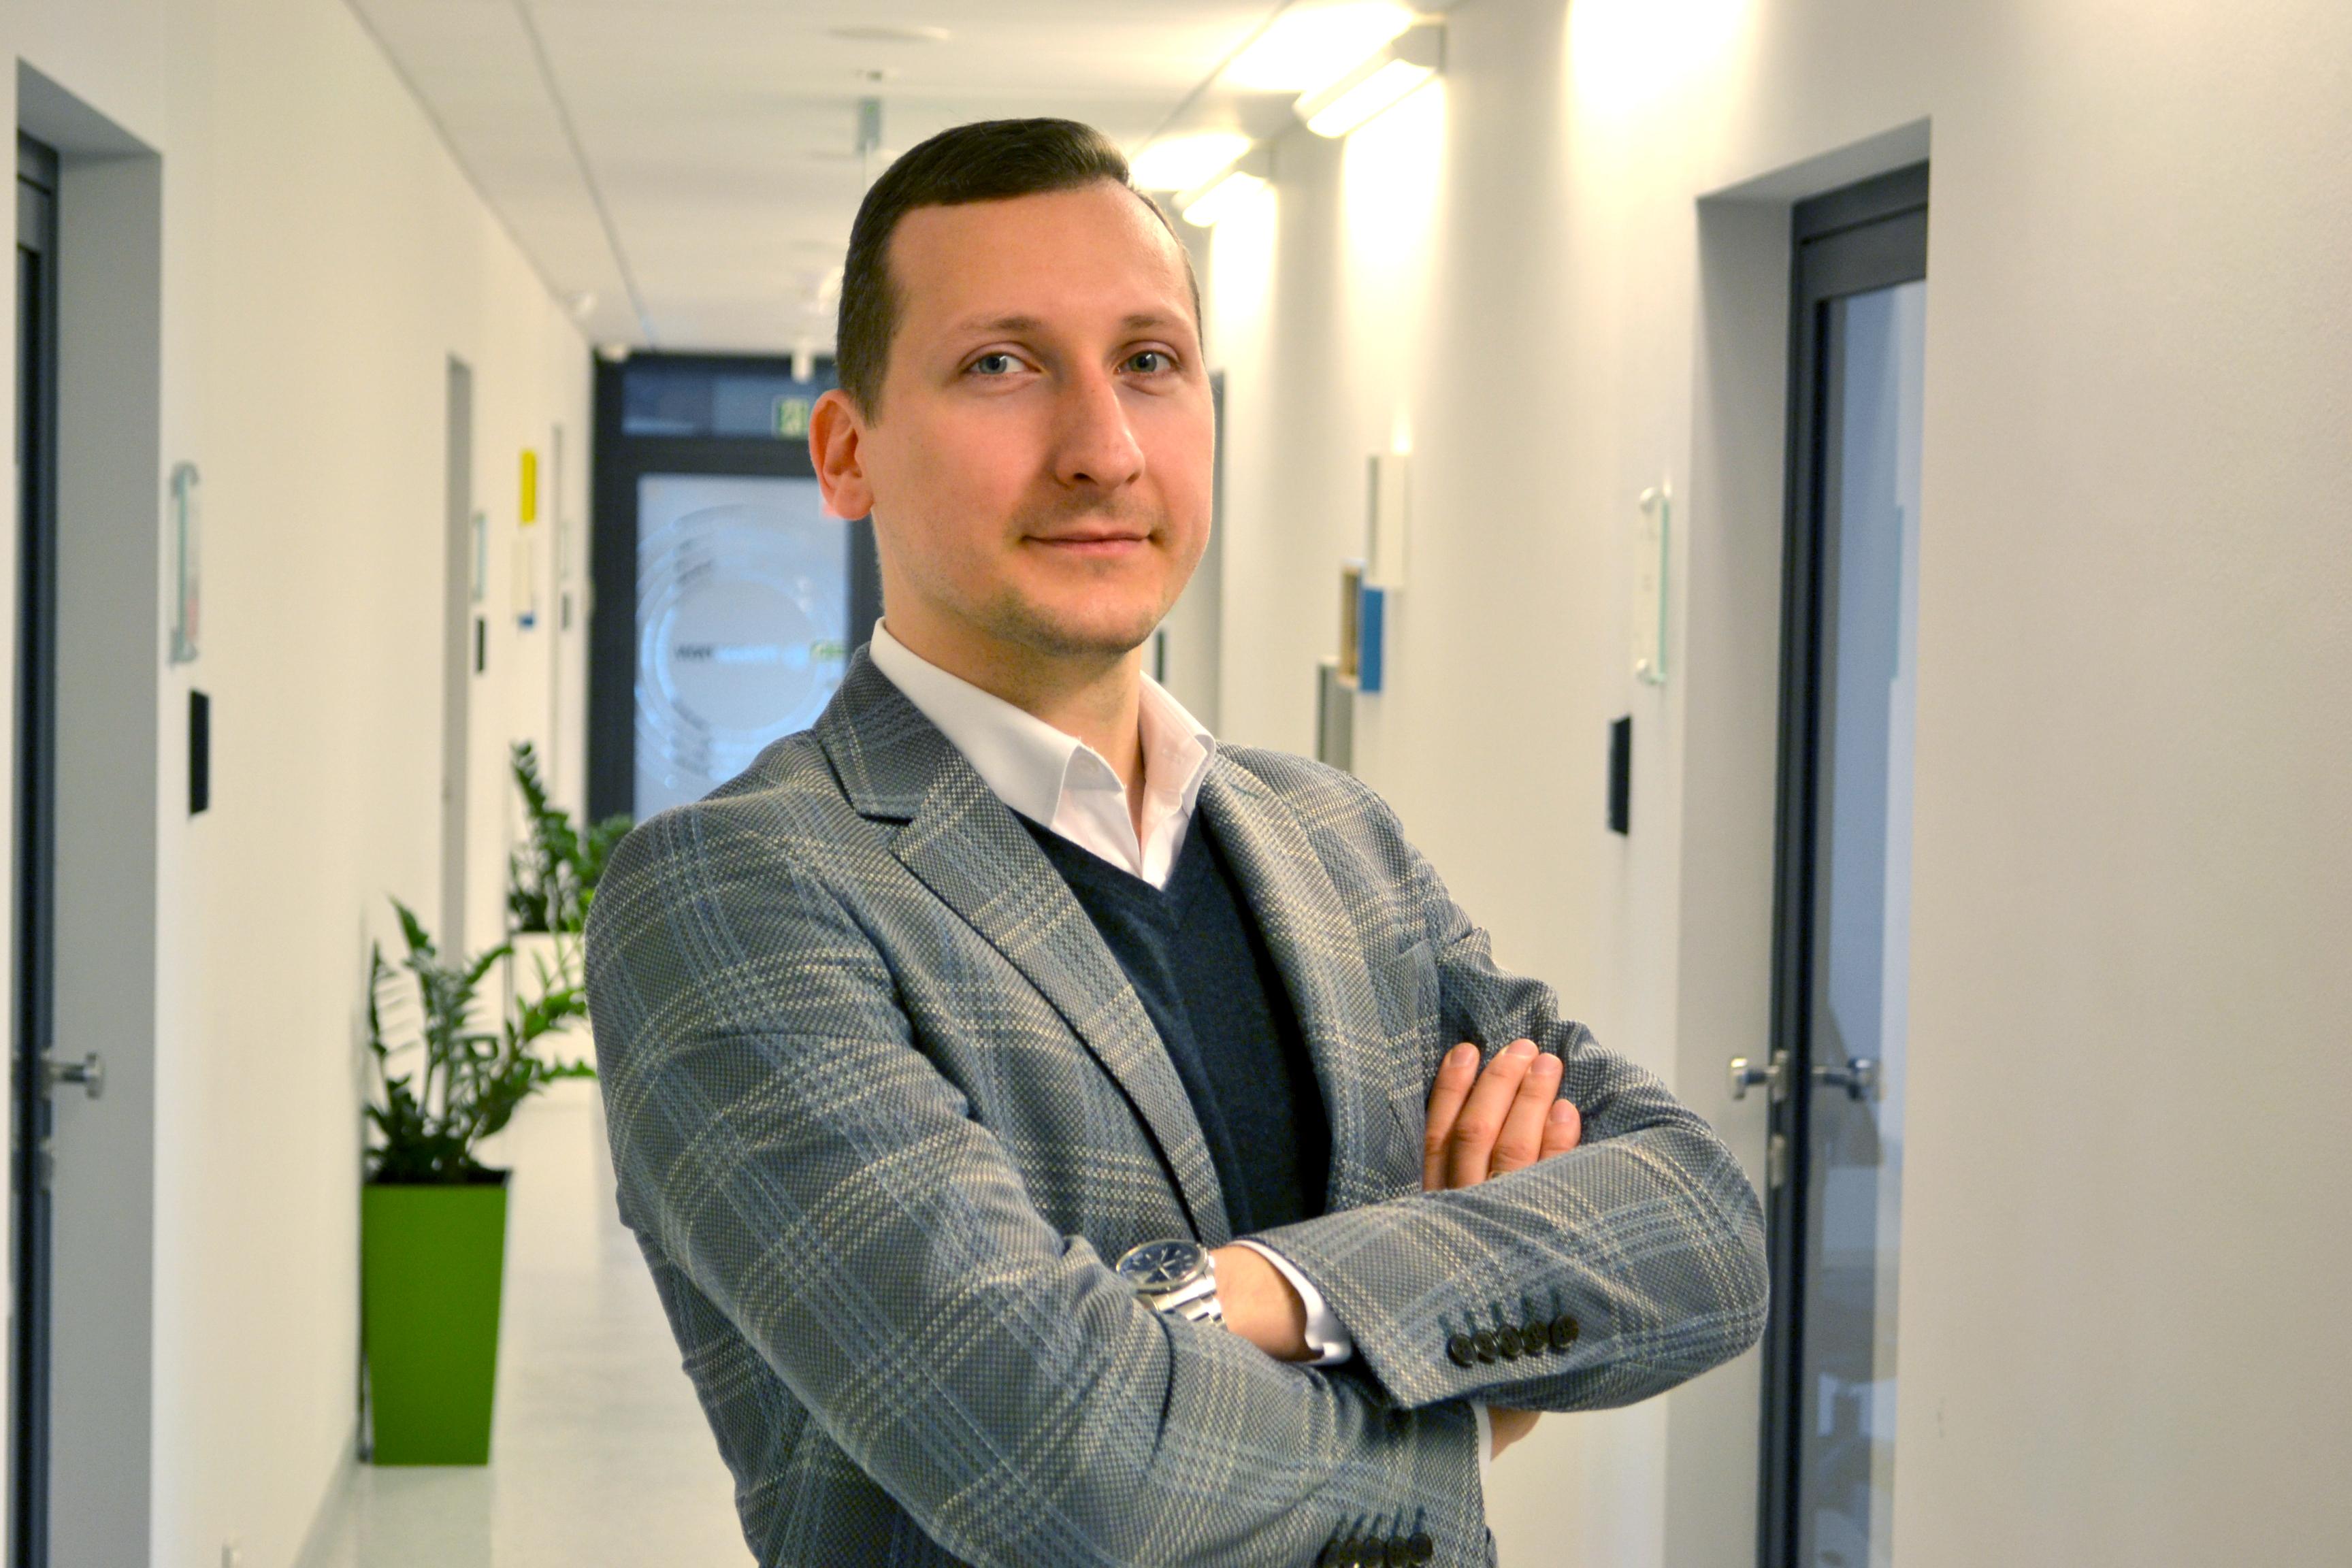 Wojciech Wąsik / Chief Digital Officer